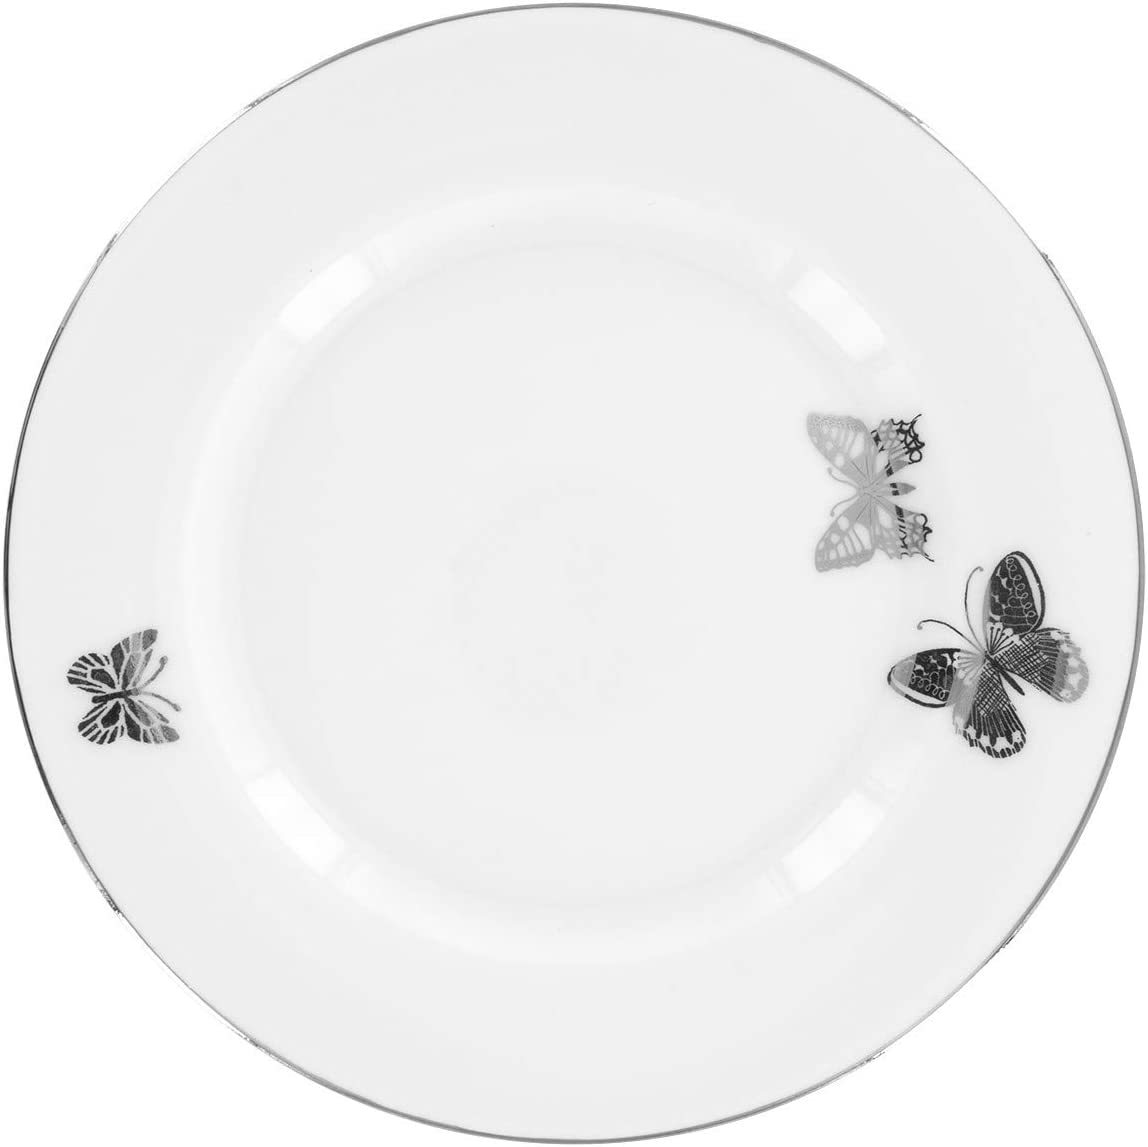 Mariposa Dessert Plates - of Philadelphia Mall 4 Max 61% OFF Set